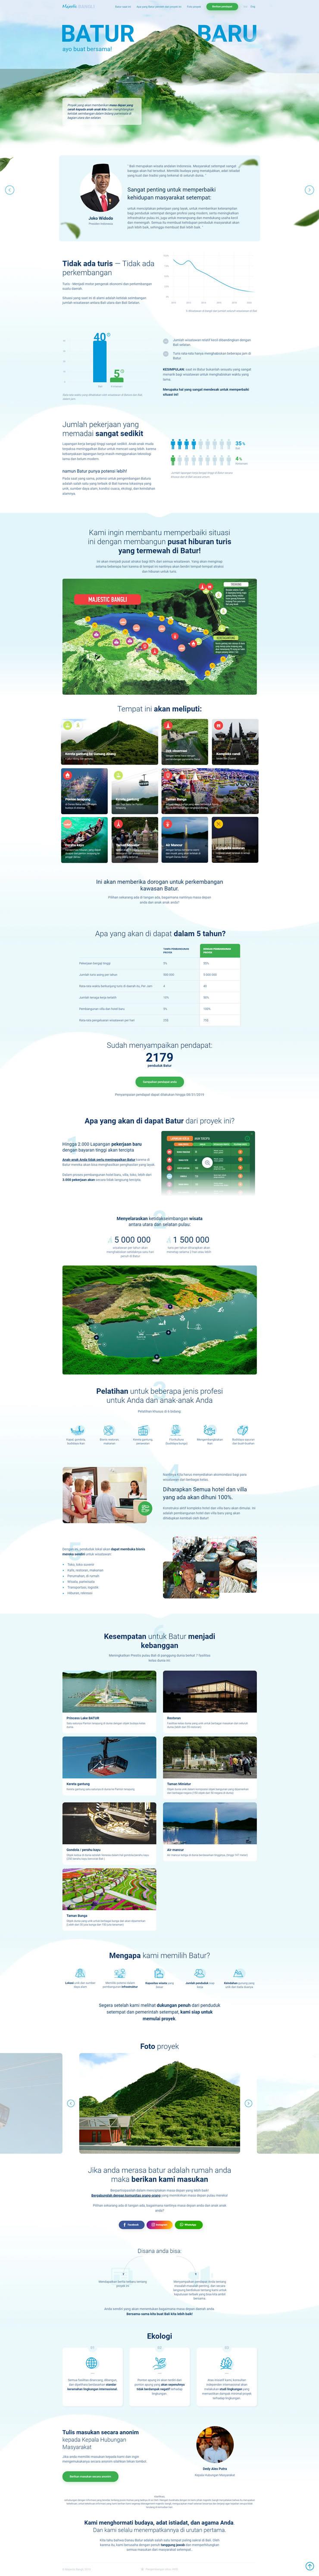 Image may contain: map, water and screenshot